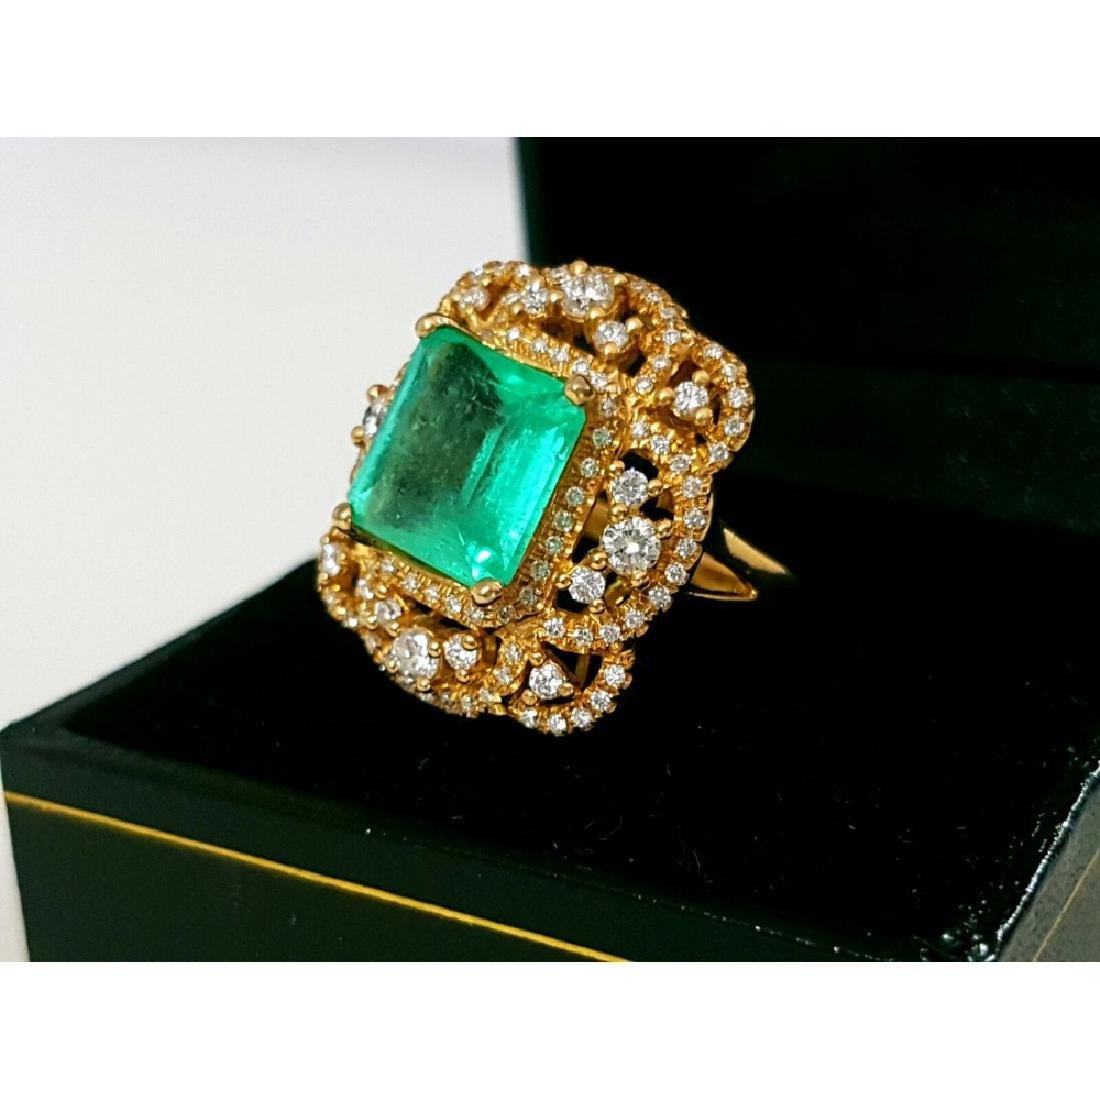 18k Gold Vintage 6 ct Emerald Diamond Cocktail Ring - 4